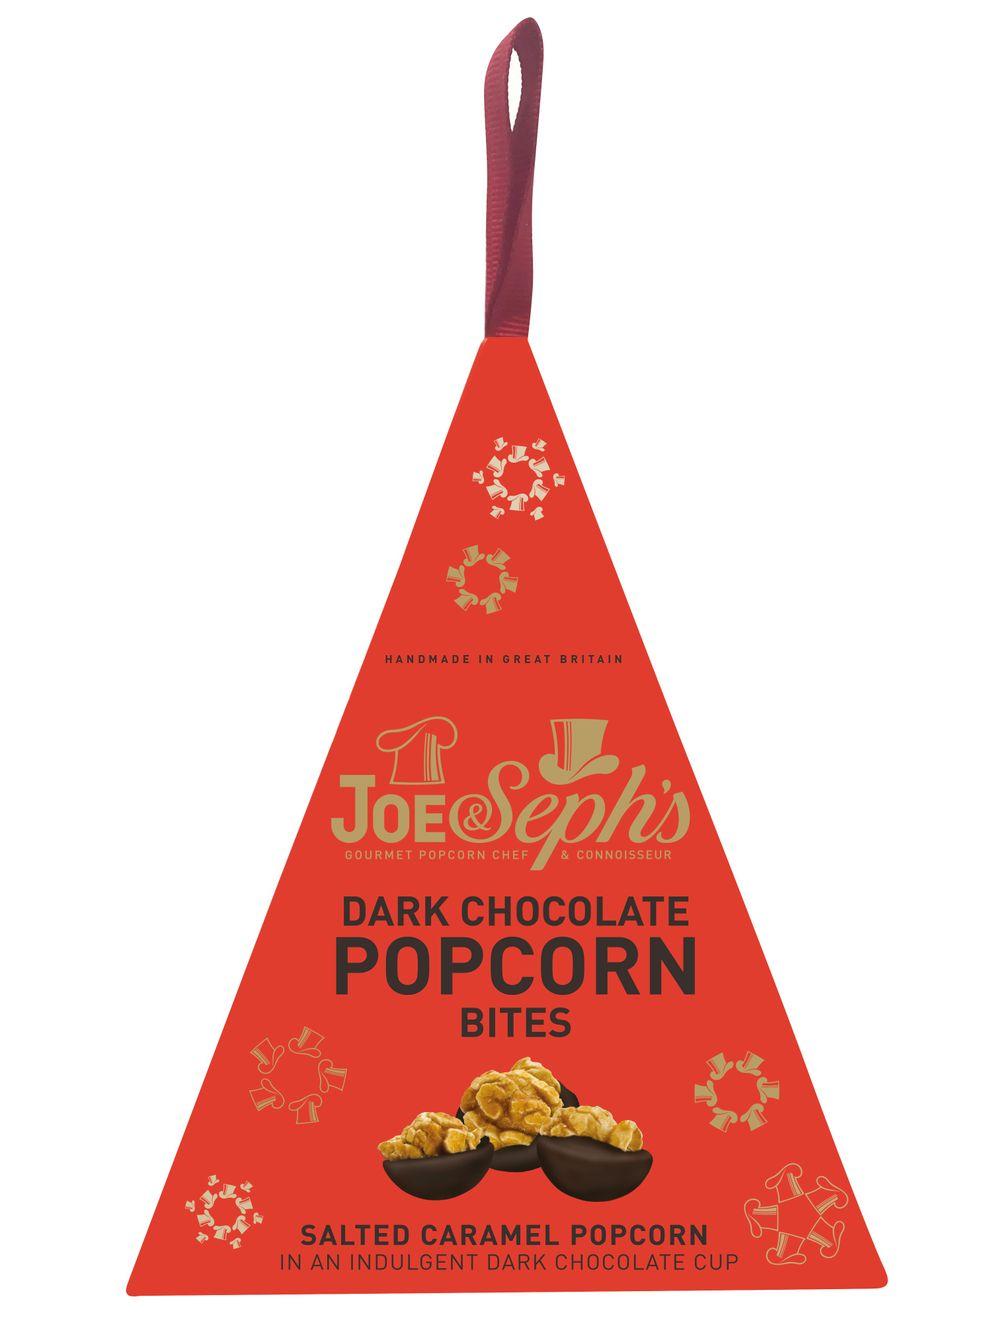 Dark Chocolate Popcorn Bites Bauble